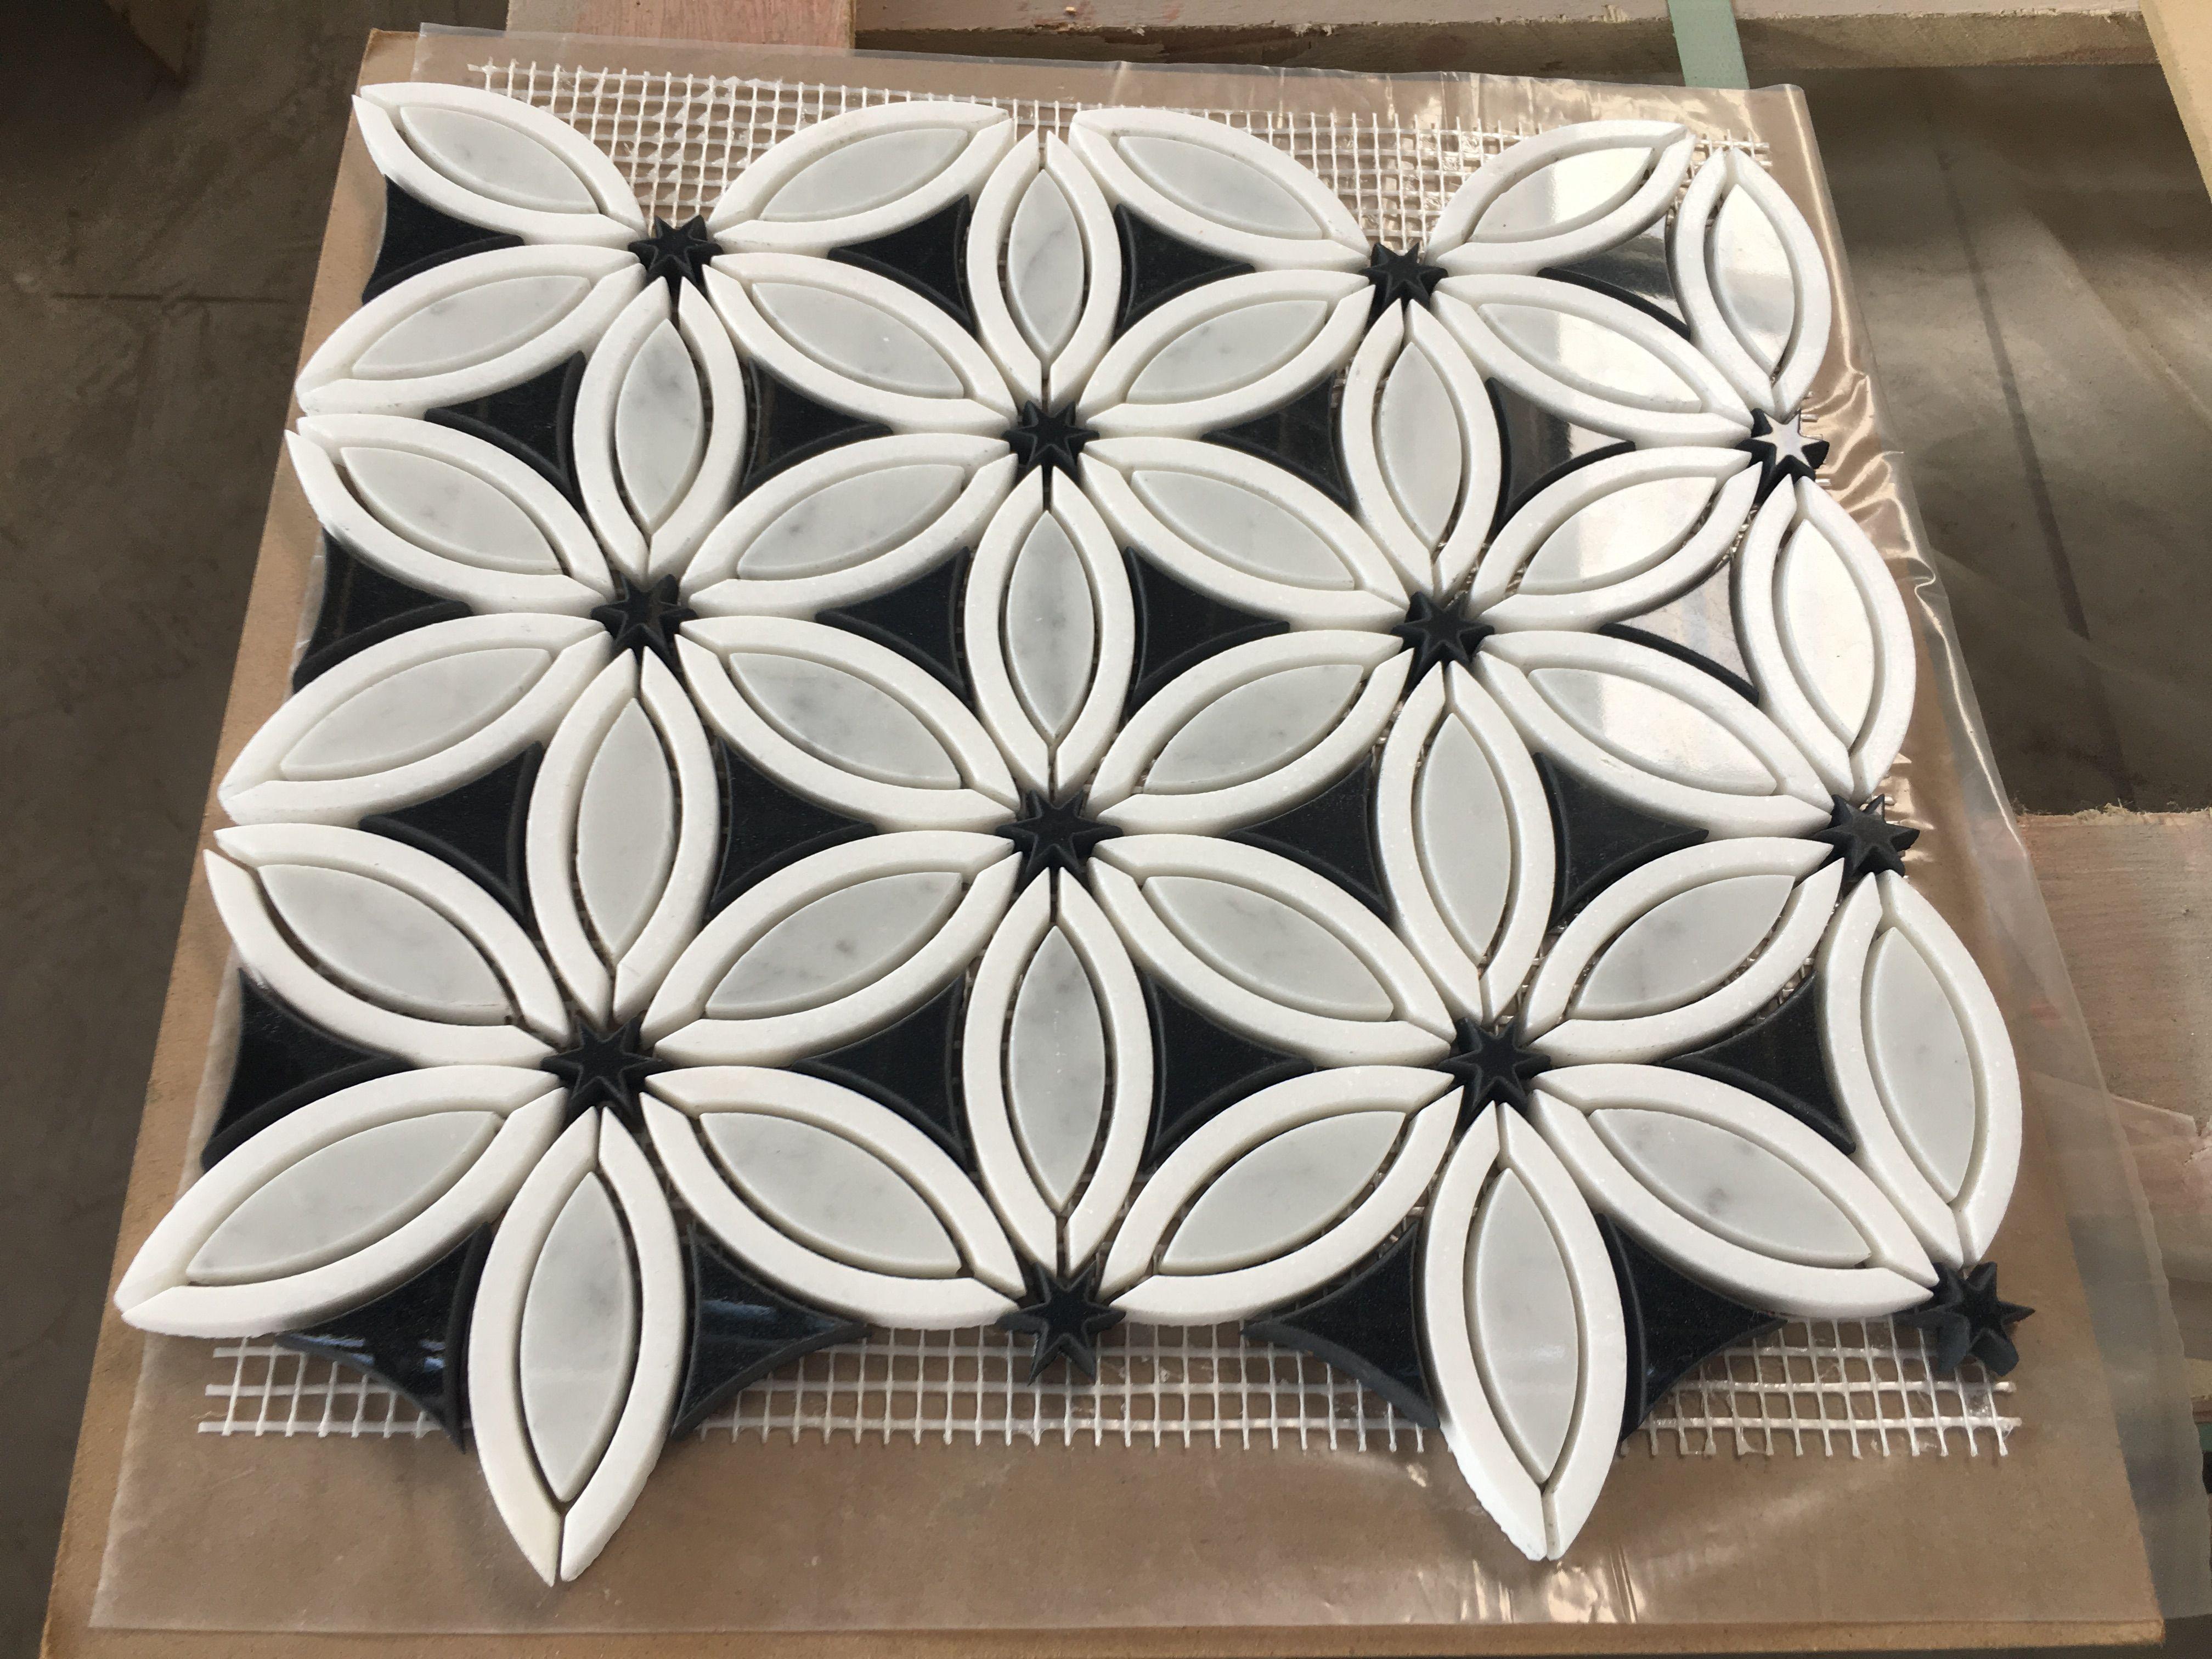 New Design Flower Pattern Water Jet Cutting Marble Mosaic